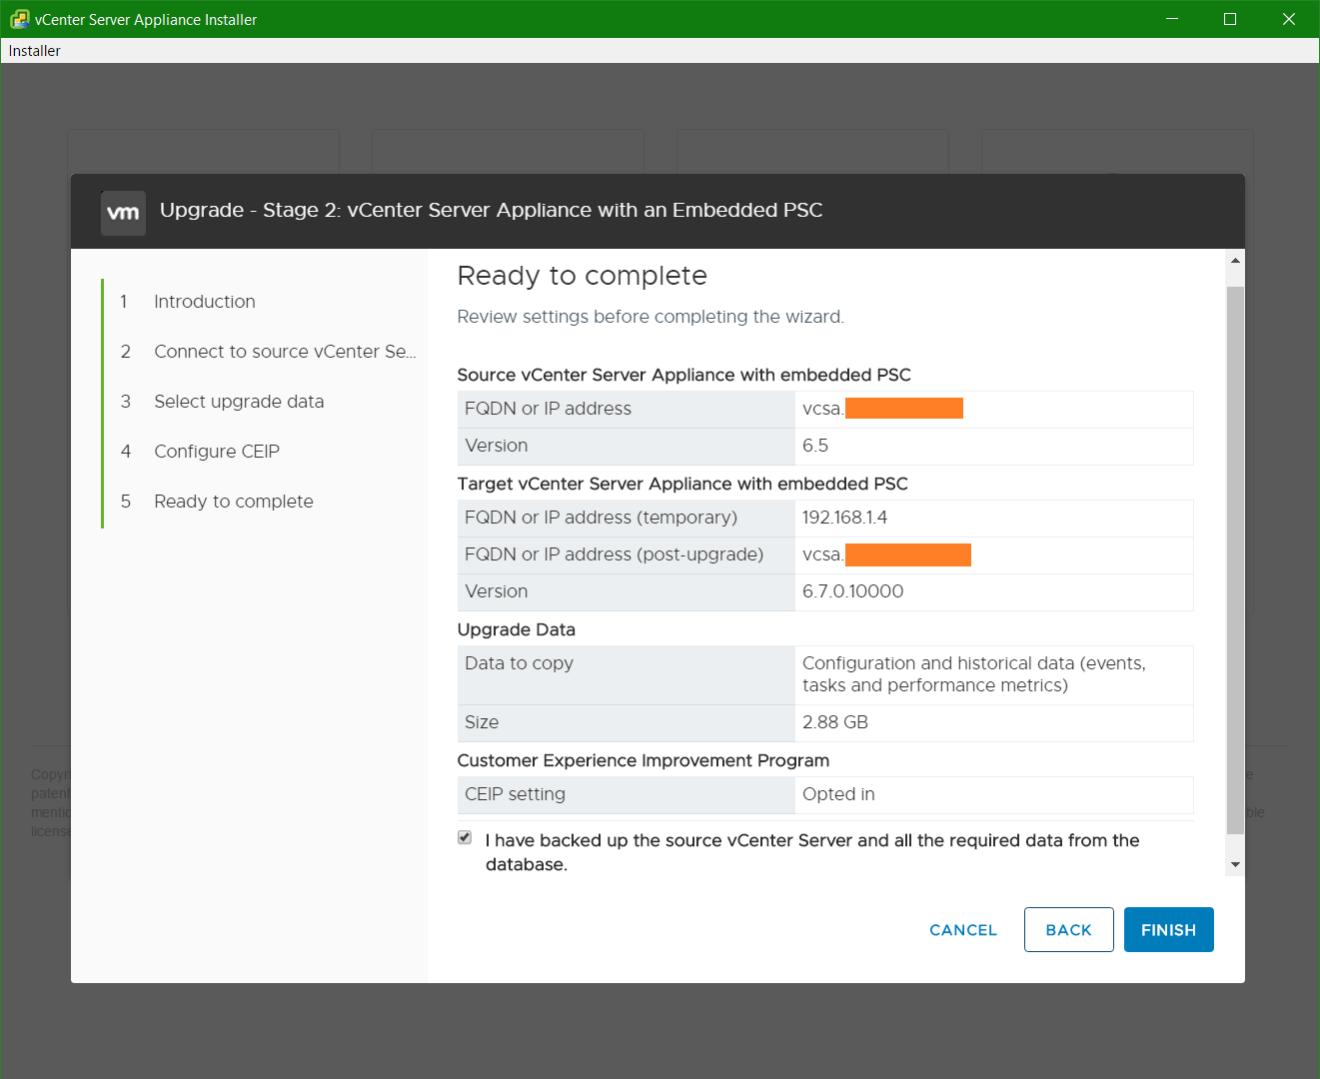 domalab.com vmware vcsa upgrade stage 2 summary